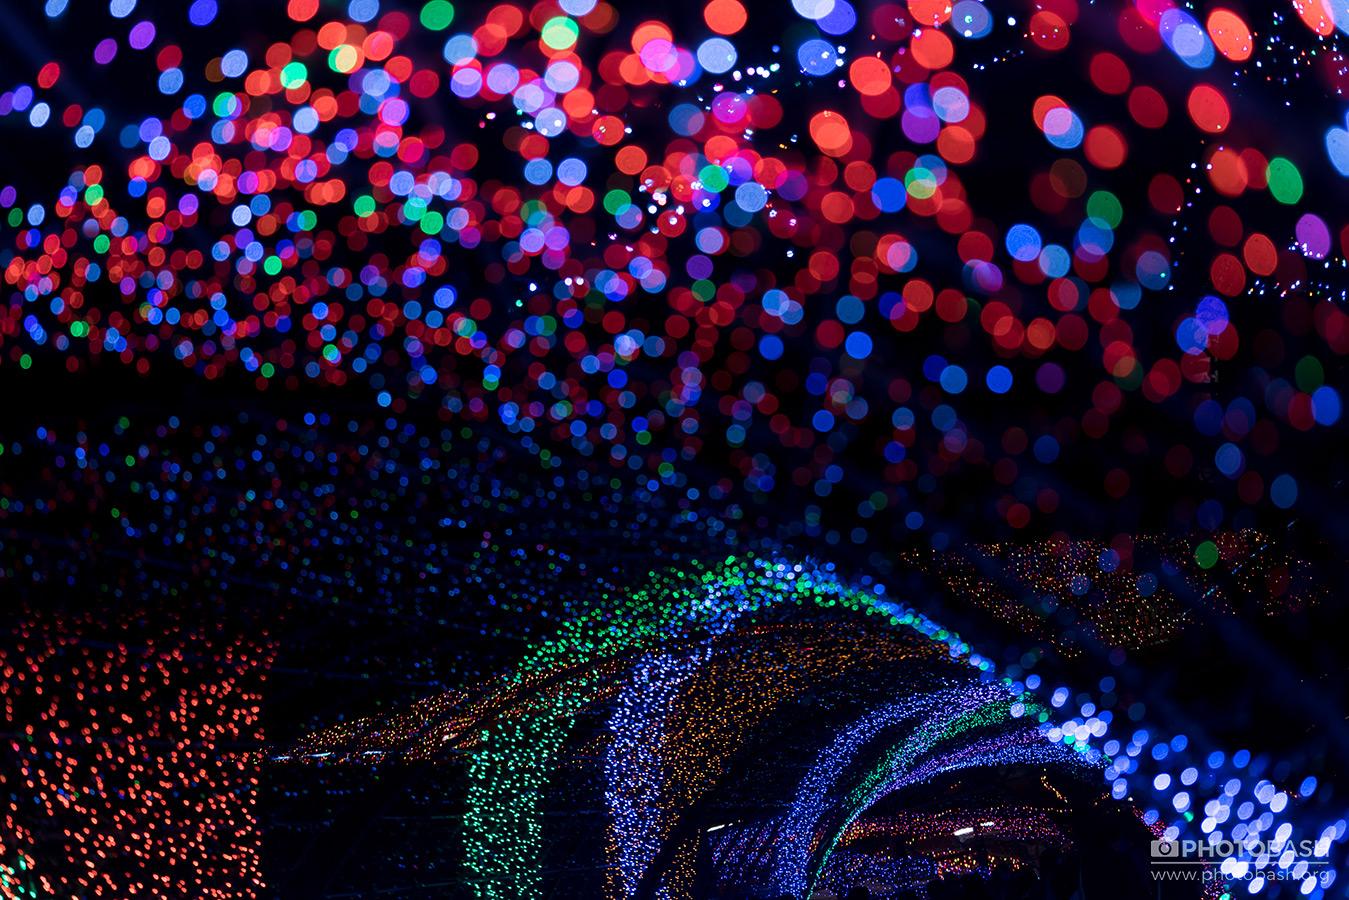 LED-Illumination-Bokeh-Neon-Swirls.jpg